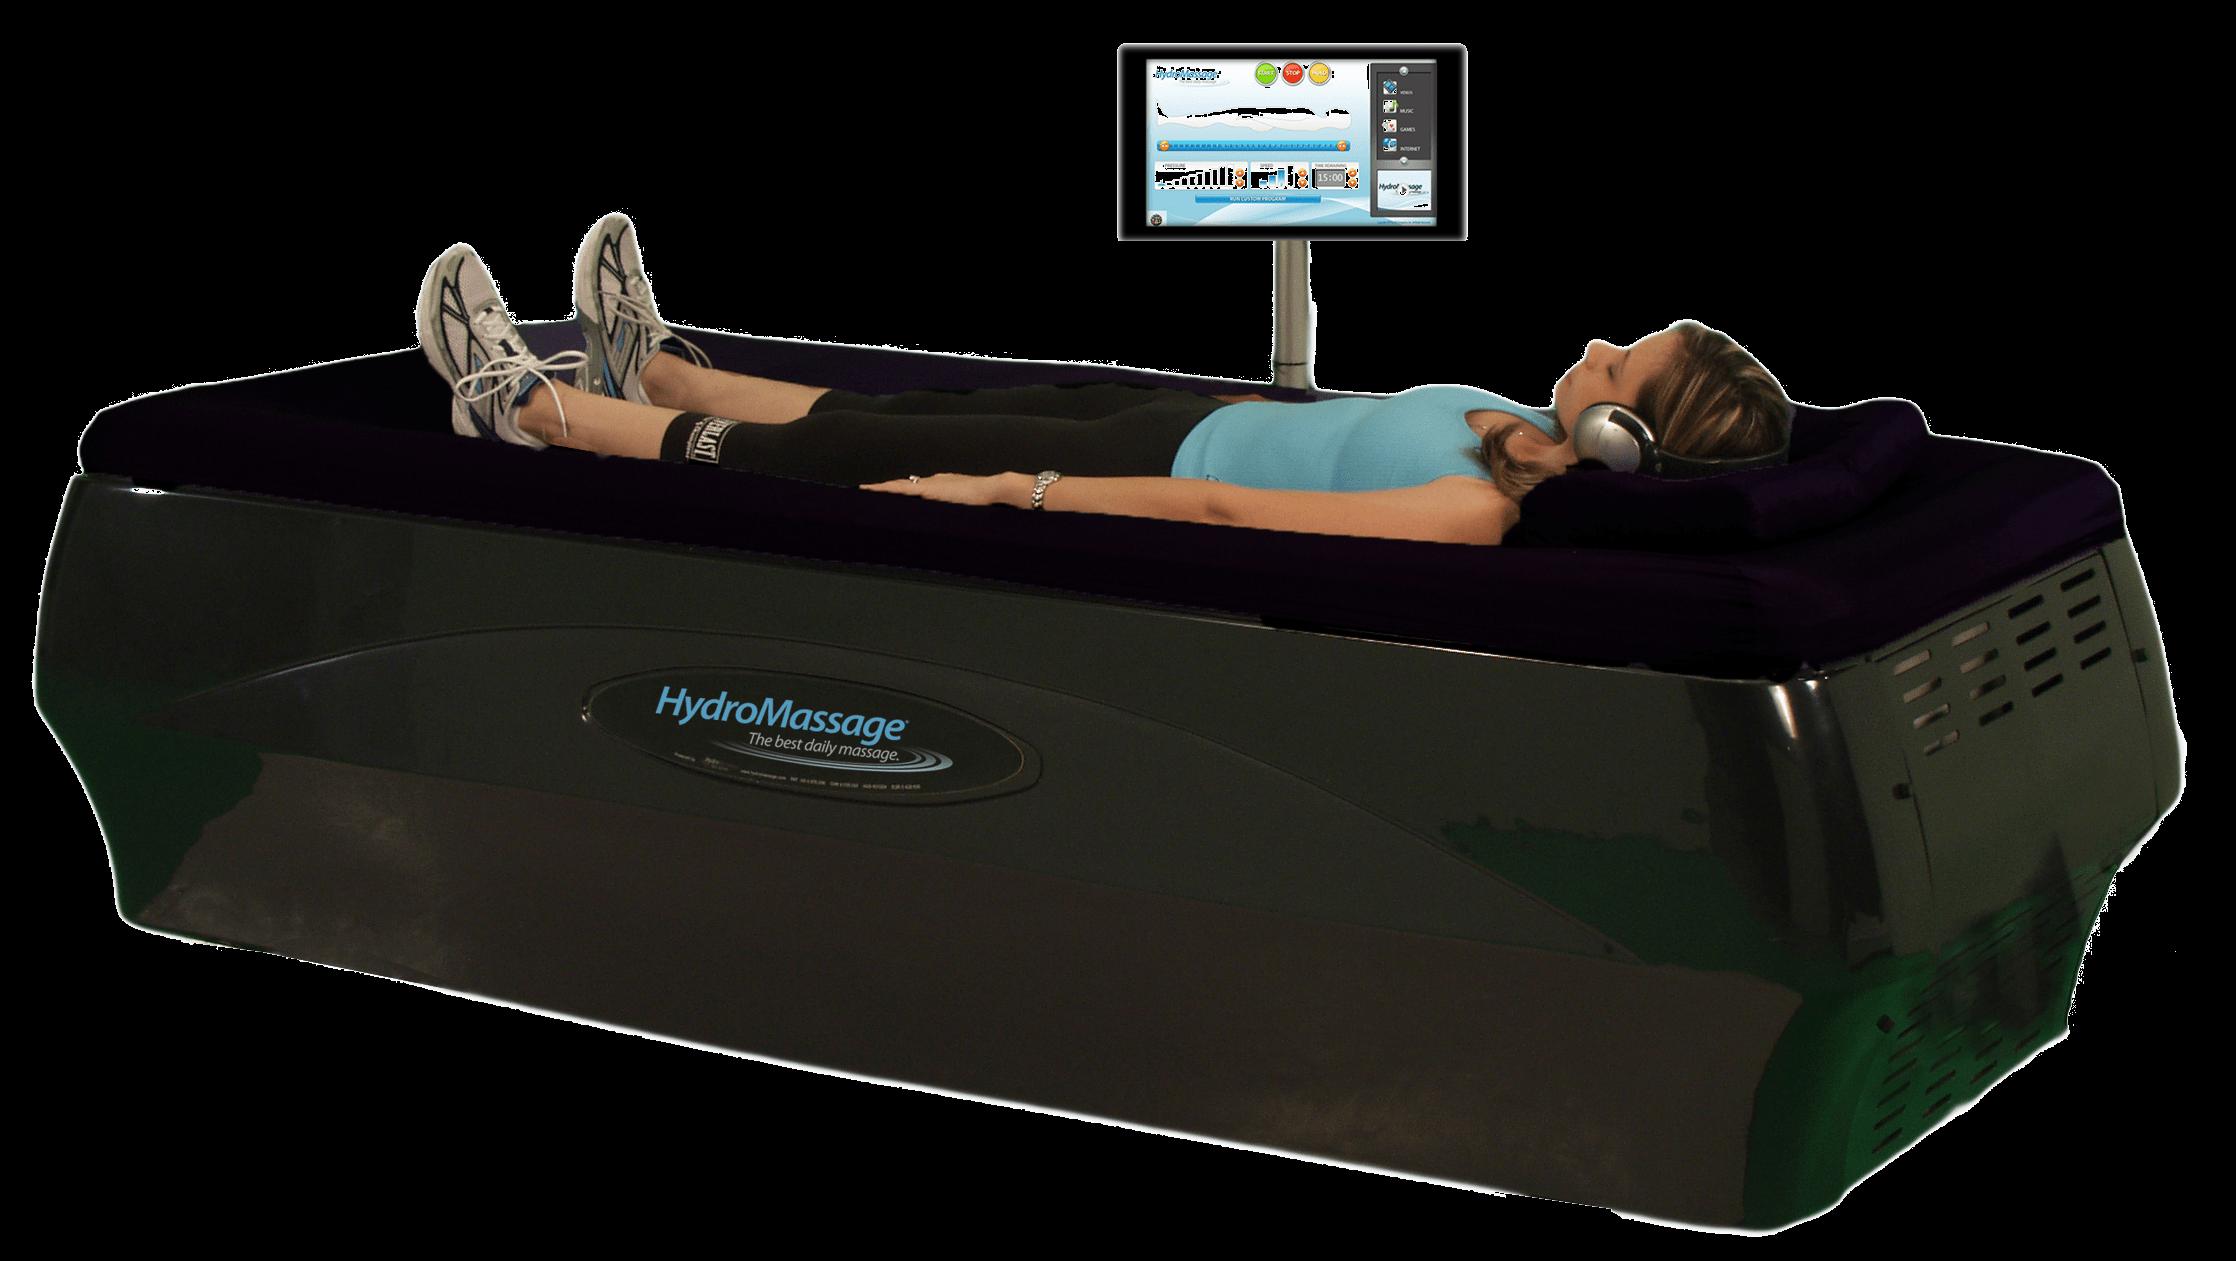 HydroMassage Bed